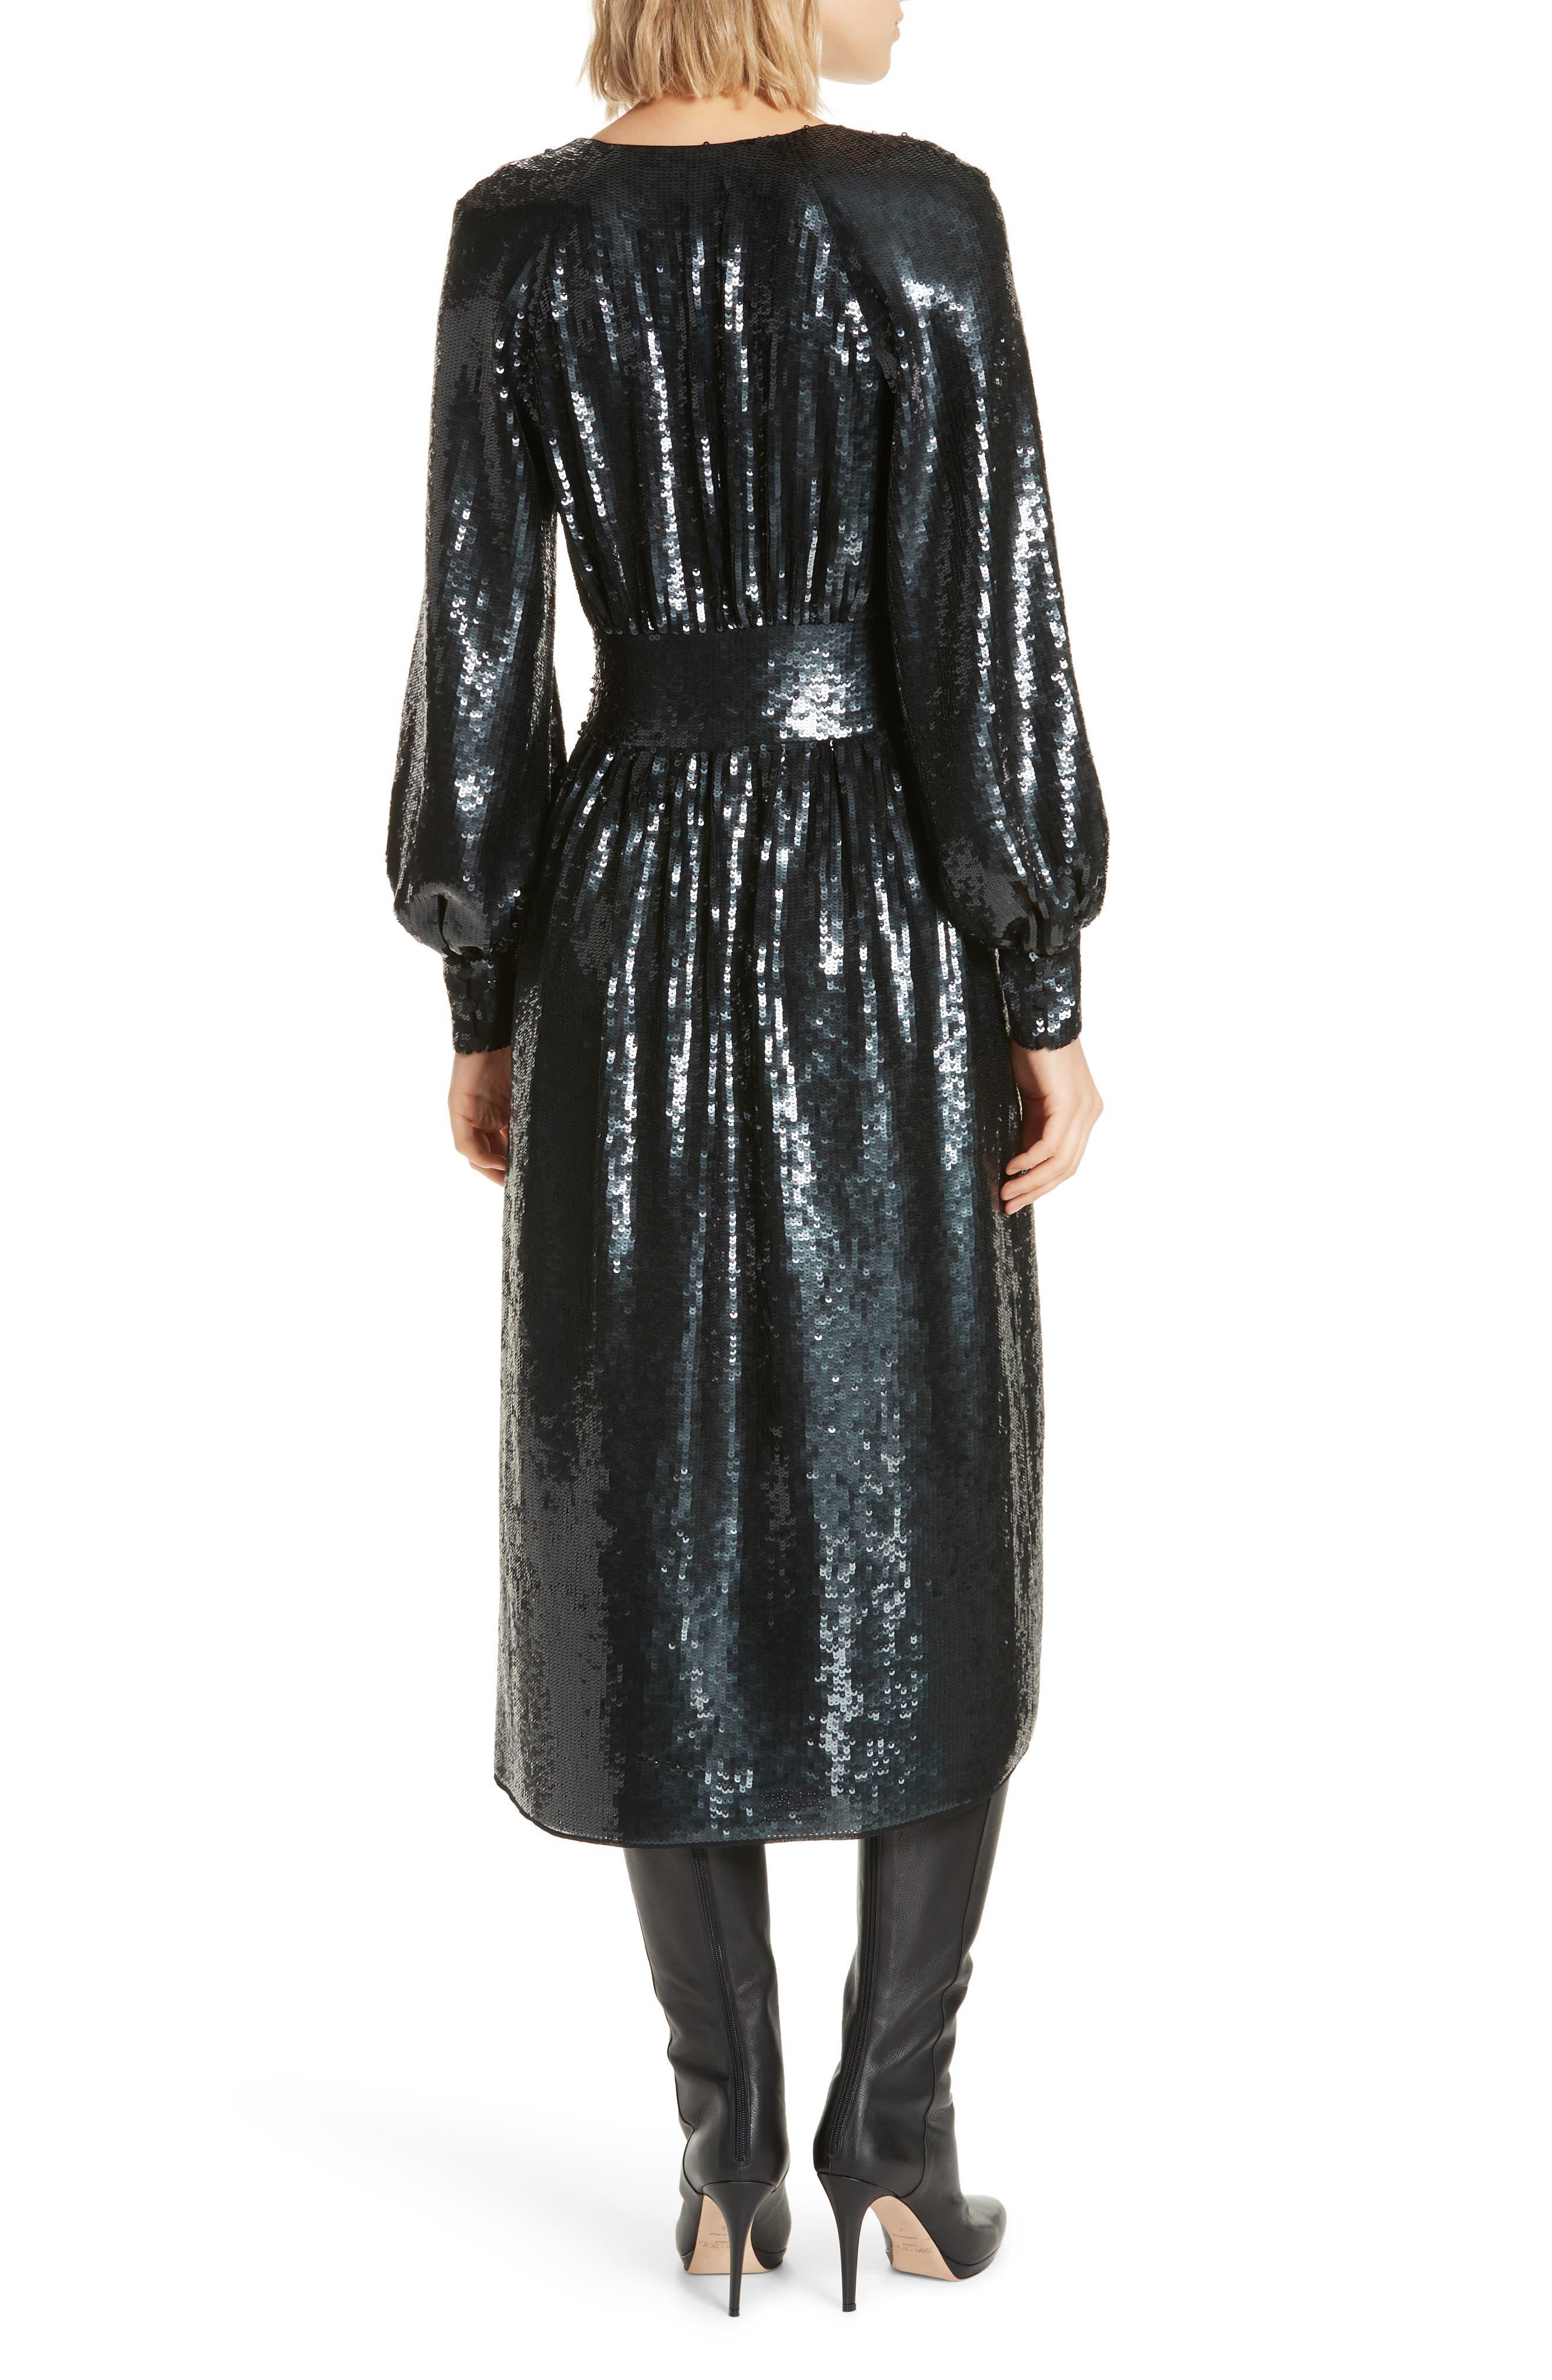 Kyria B Sequin Midi Dress,                             Alternate thumbnail 2, color,                             001